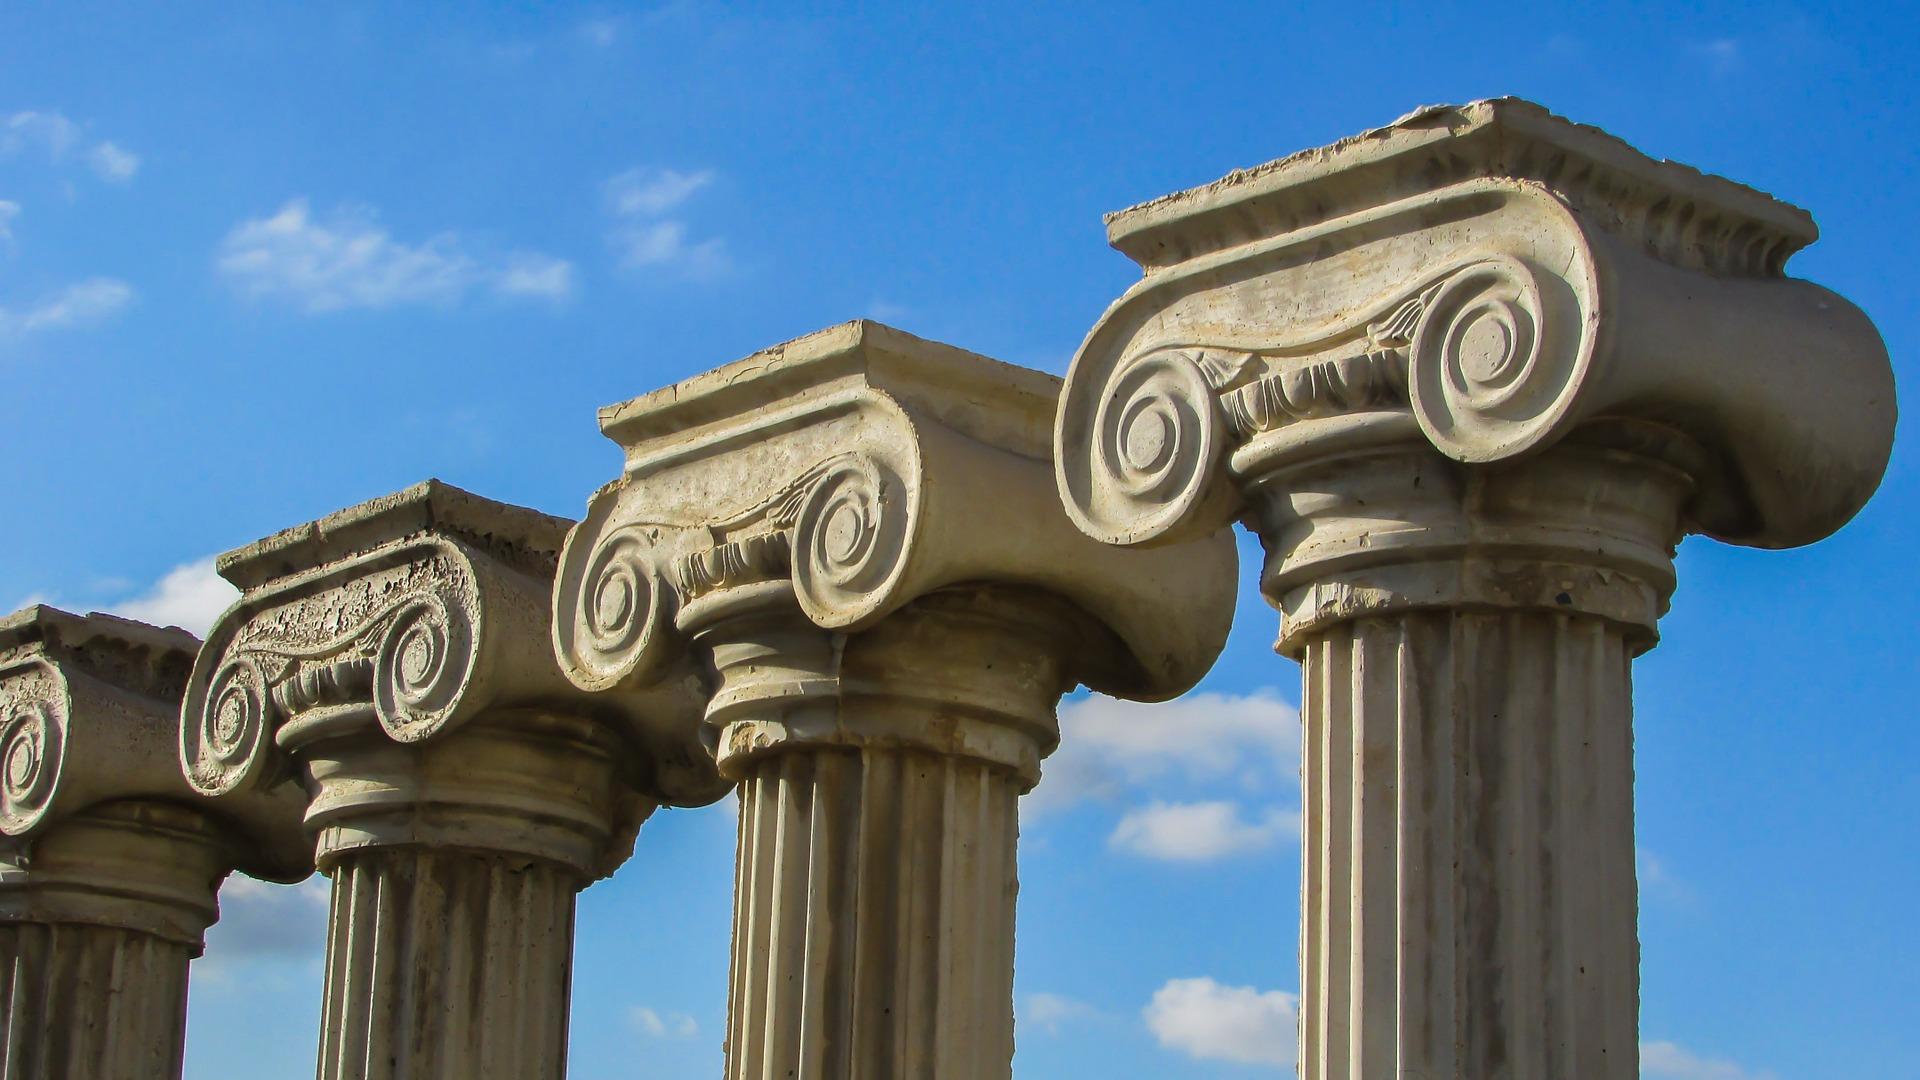 pillar-capitals-1220665_1920.jpg